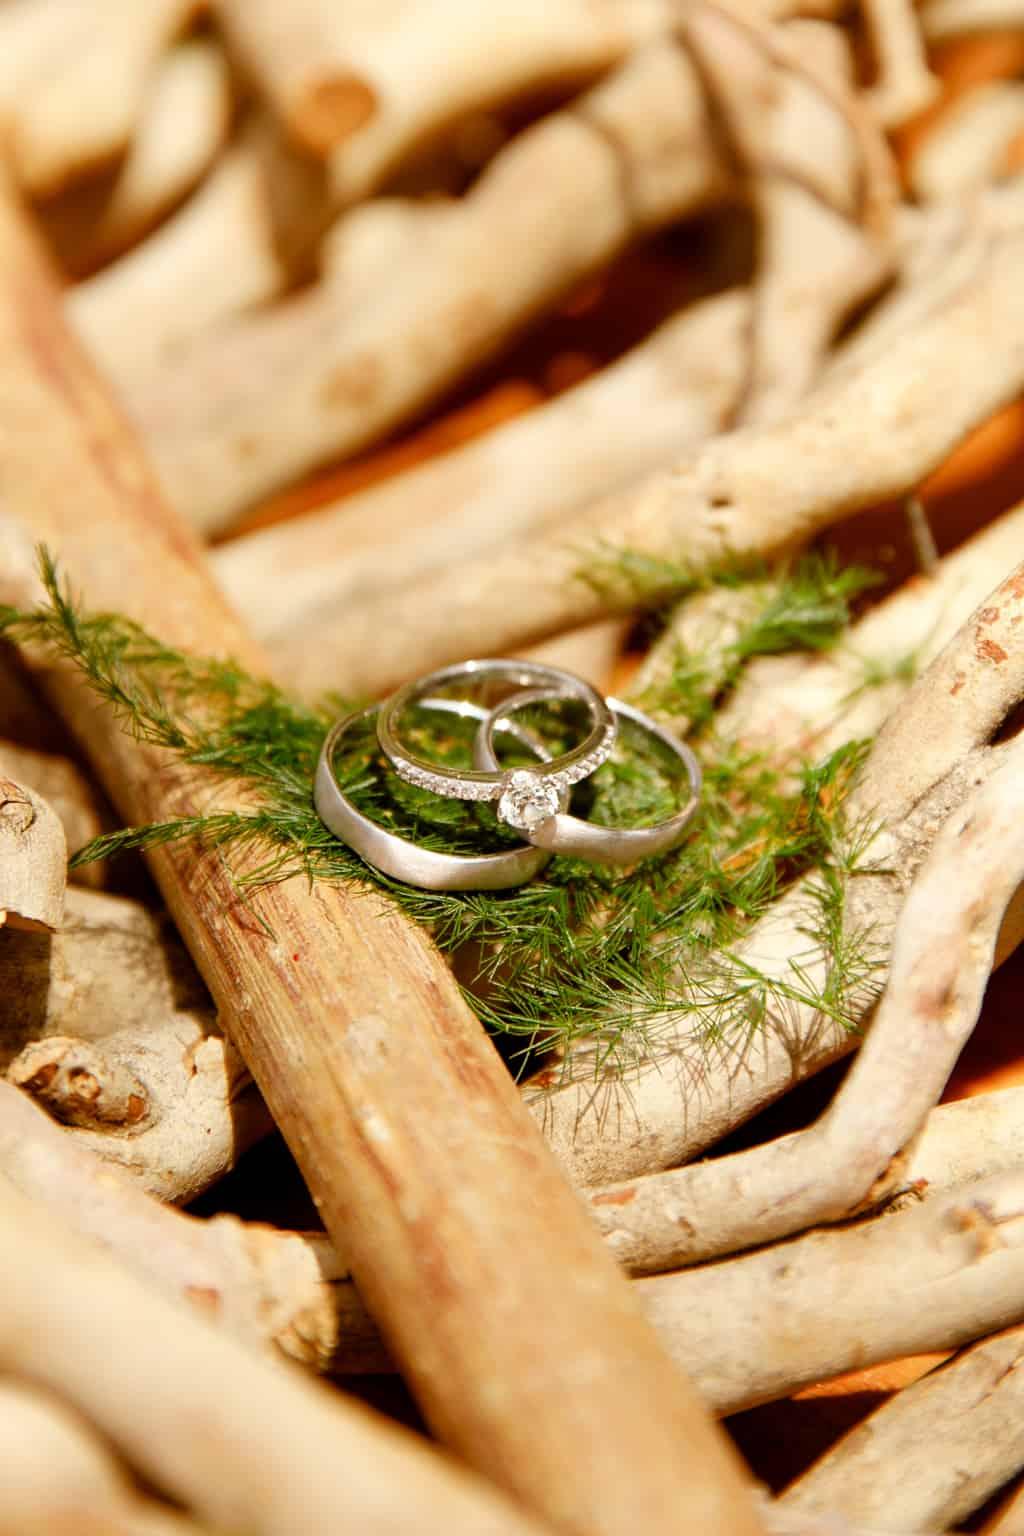 Casamento-Emanuelle-e-Alysson-Fotografia-Tadeu-Nanó-e-Luca-Antunes-244